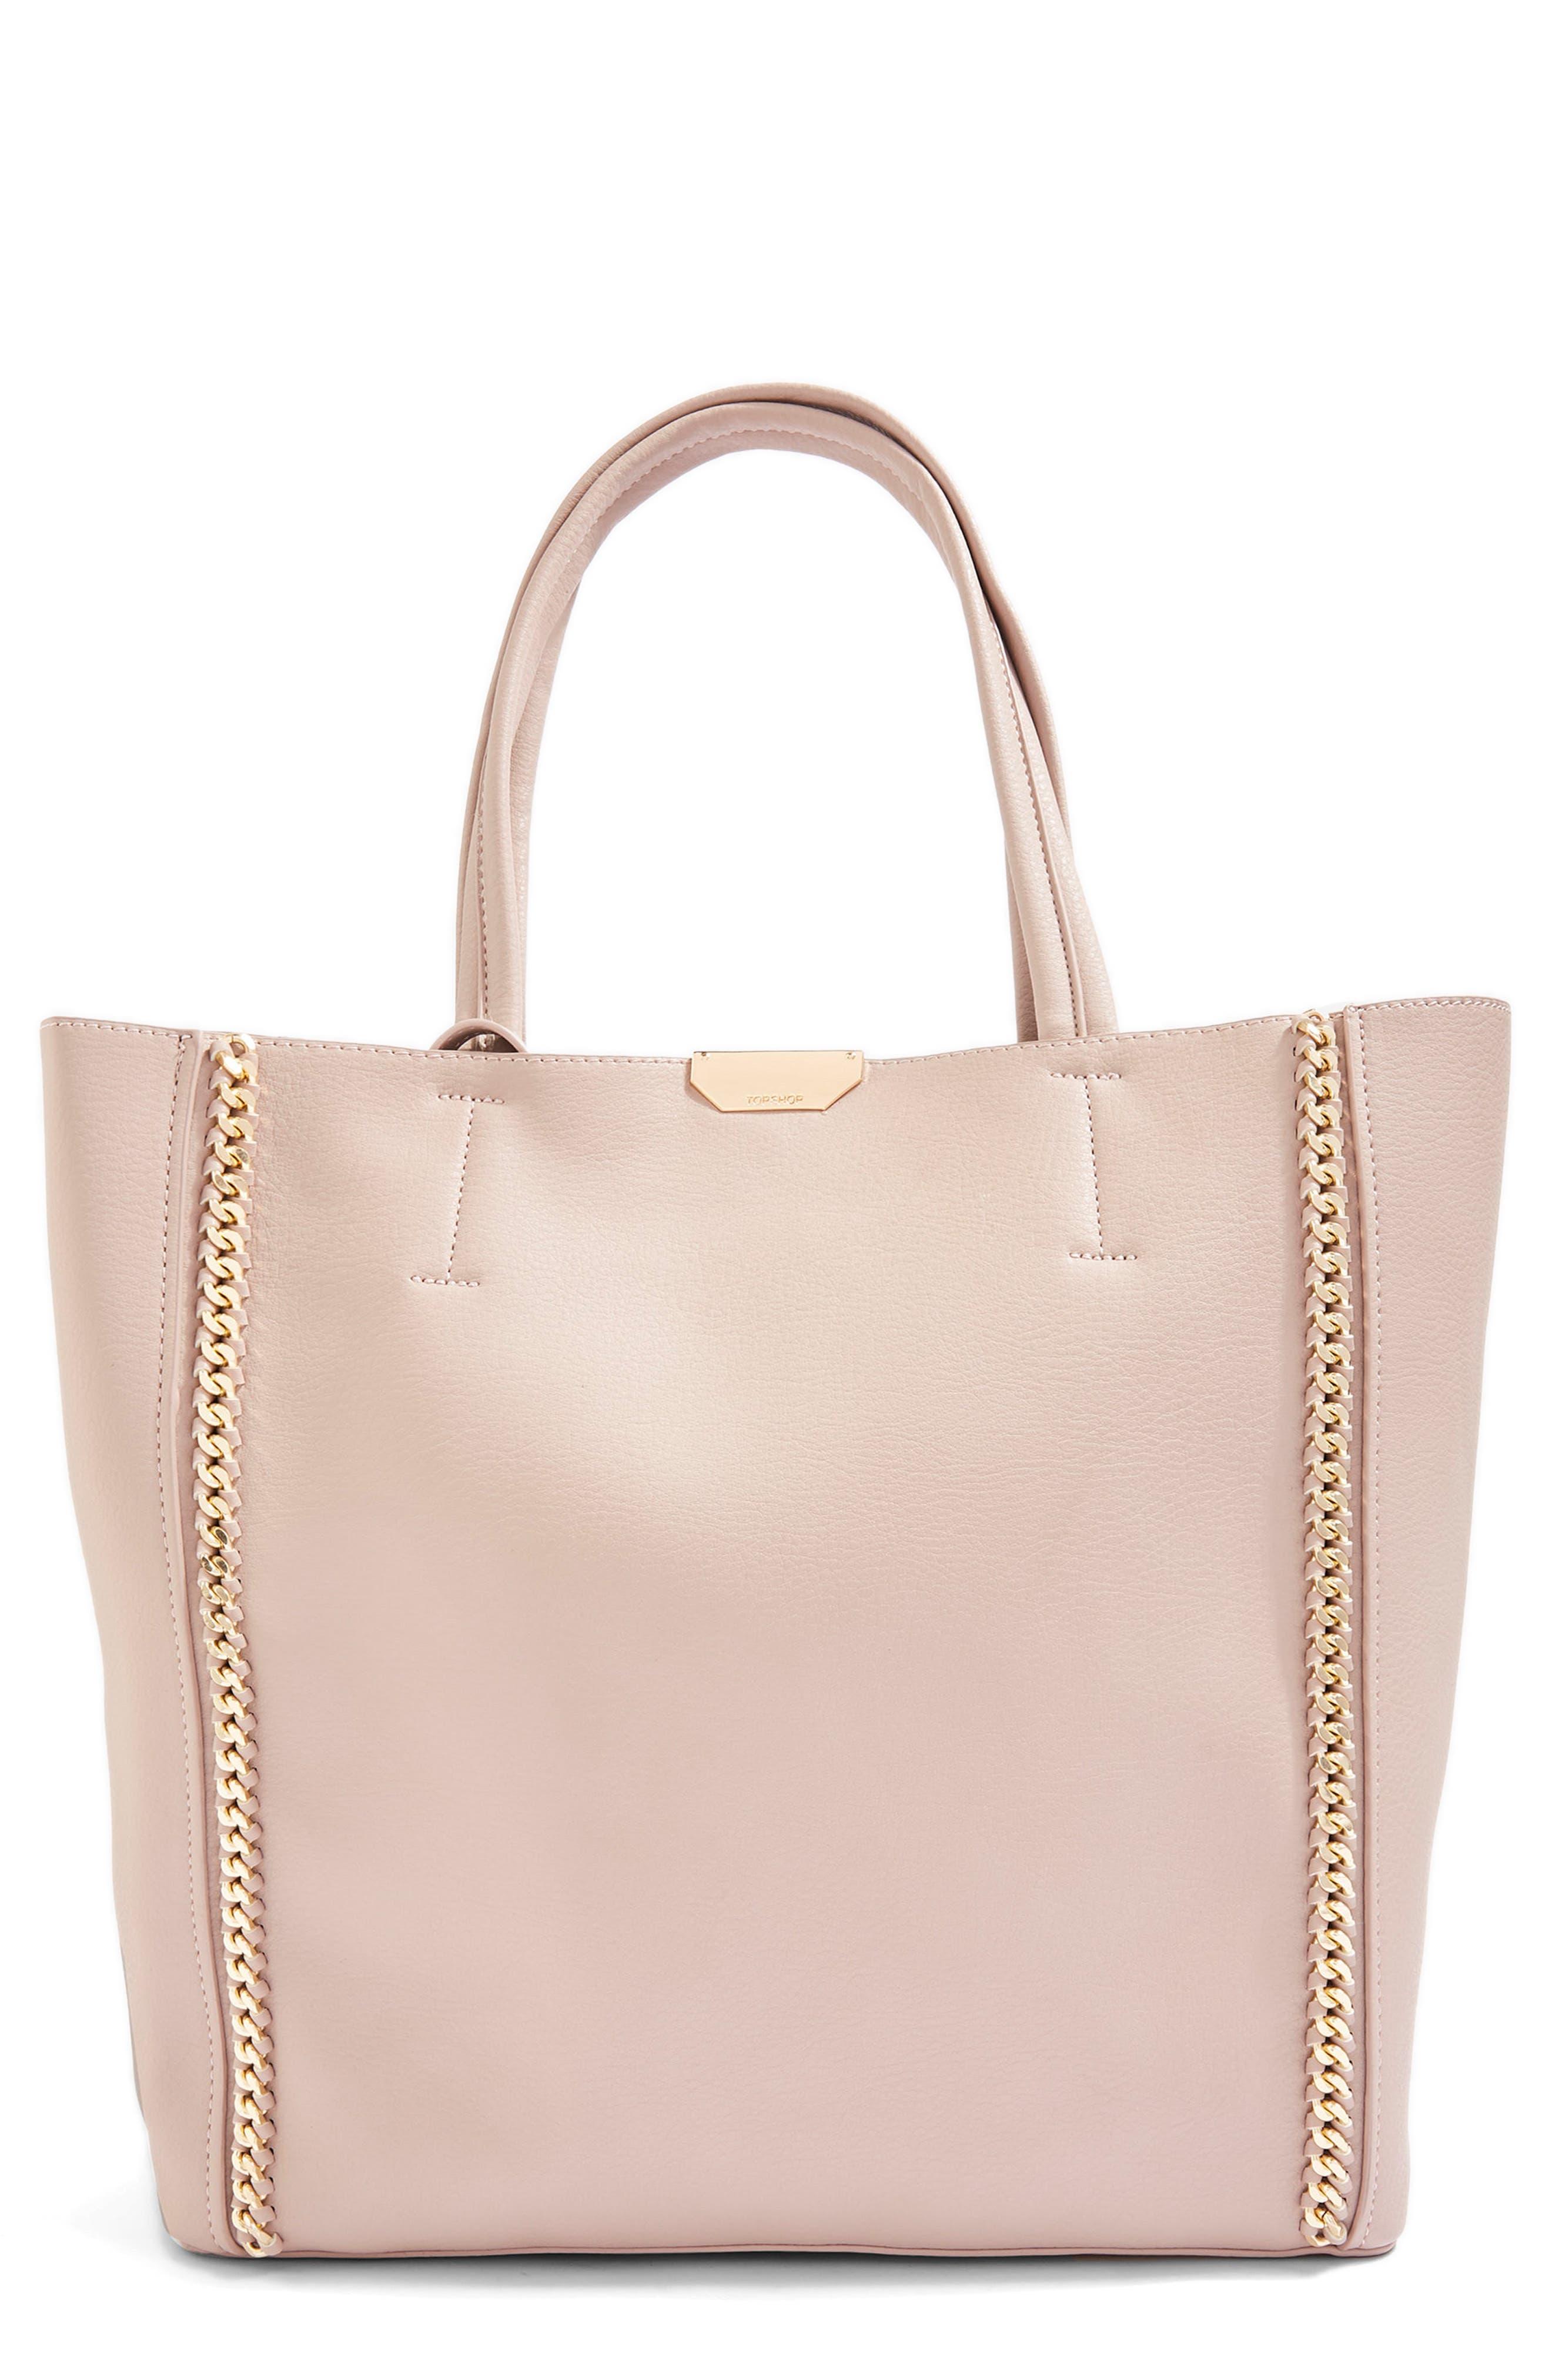 Sade Chain Shopper Bag,                         Main,                         color, Nude Multi